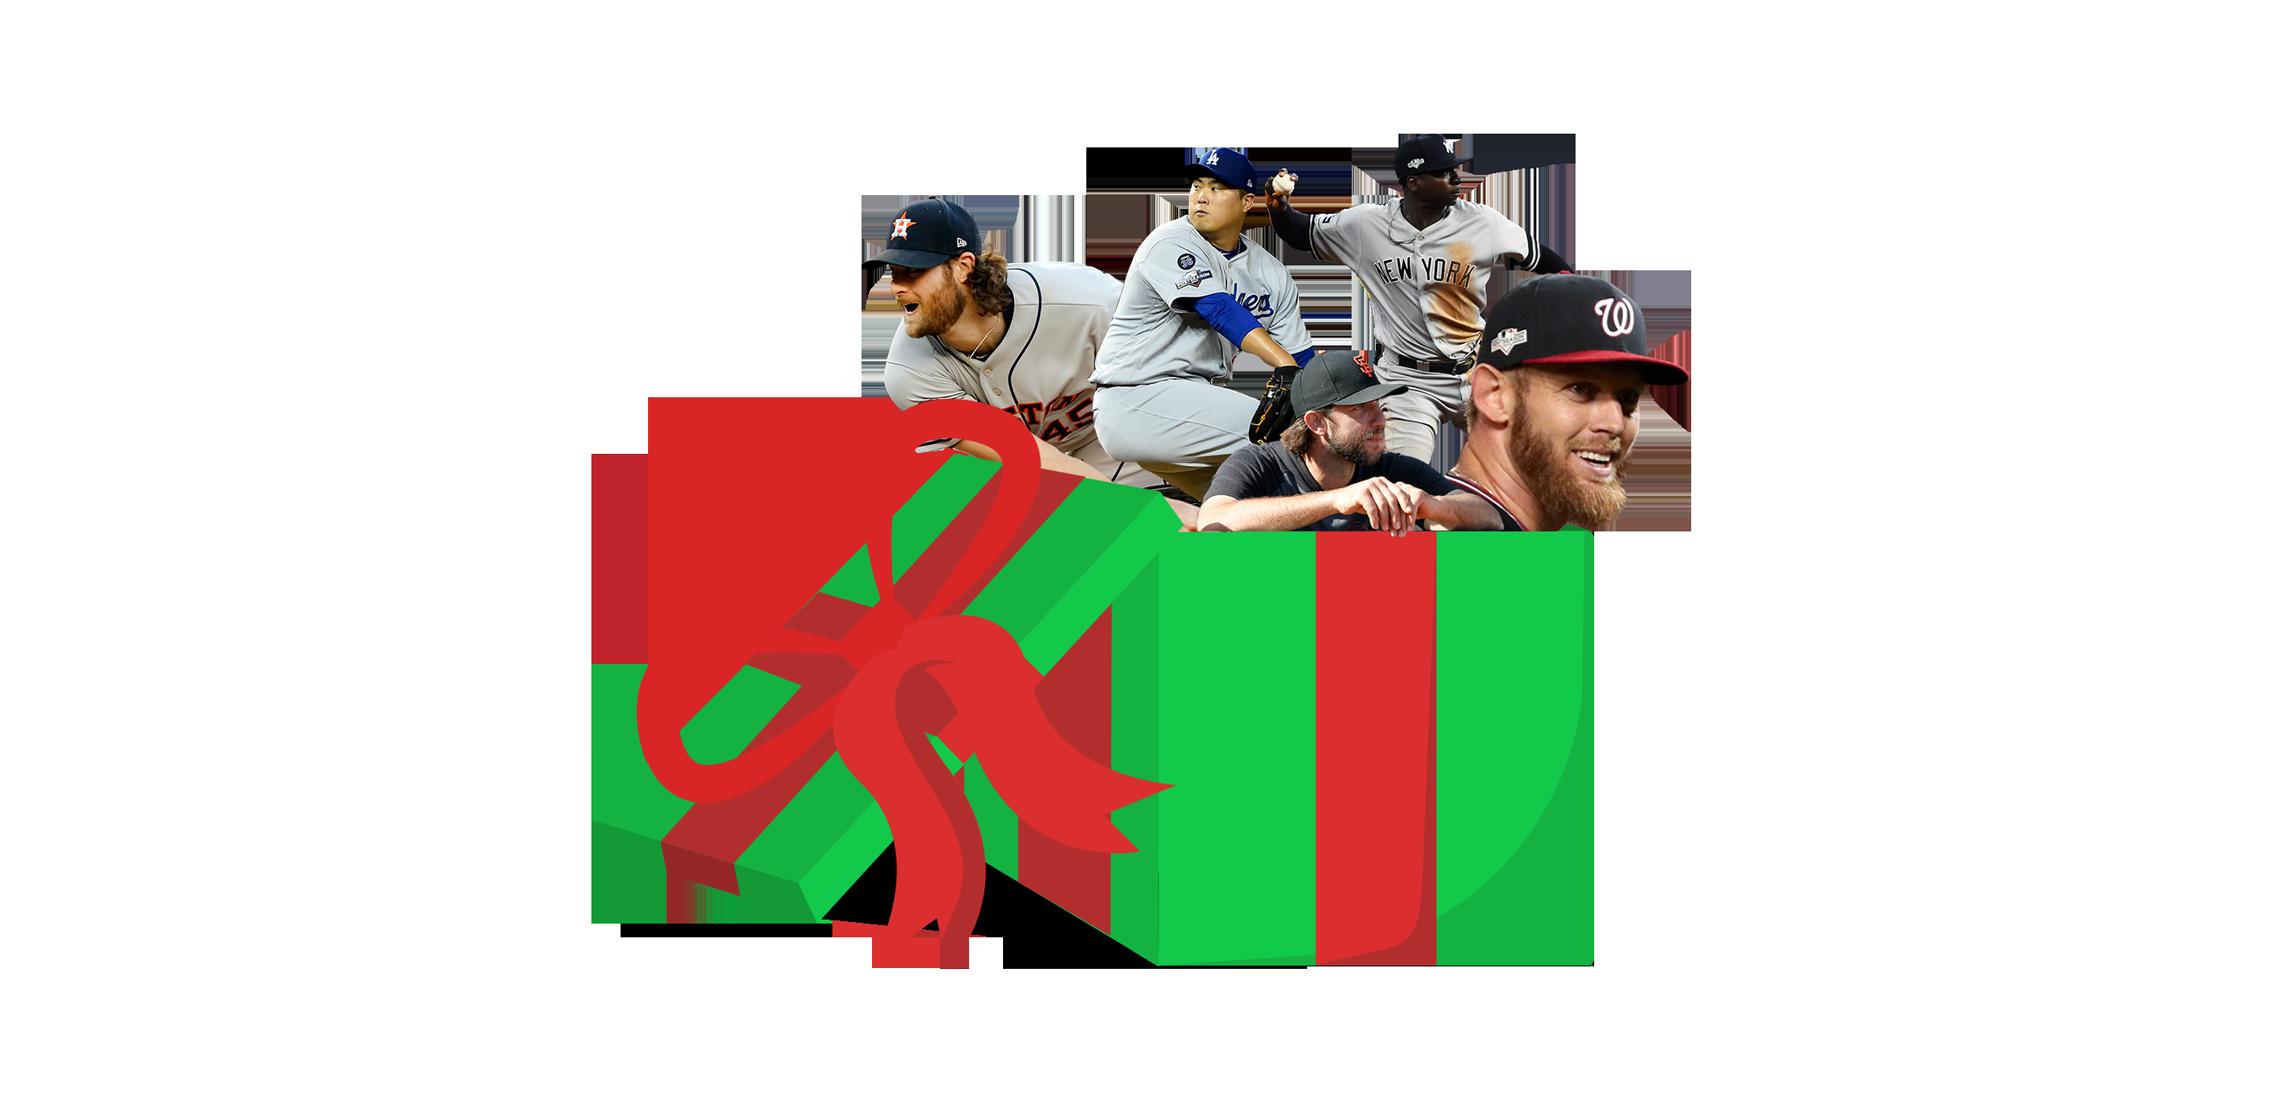 MLB holiday gift guide 2019